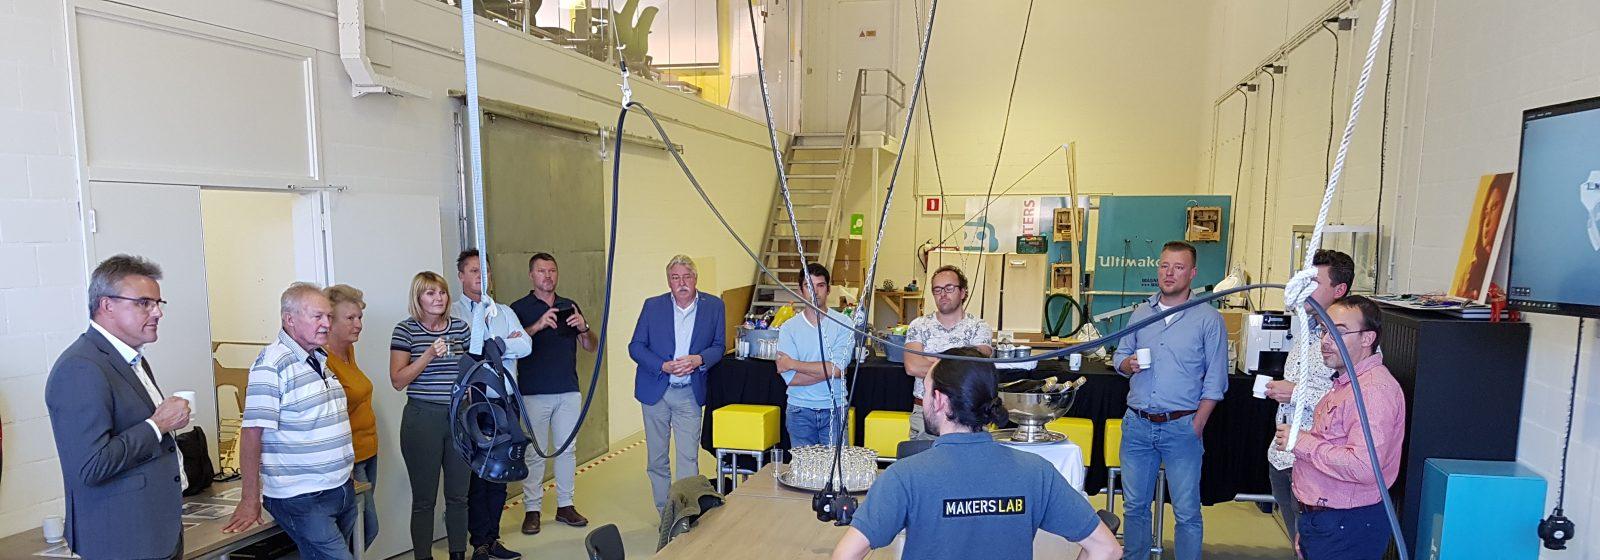 MakersLab verzorgt Virtual Reality Tour met Zegers Bouw